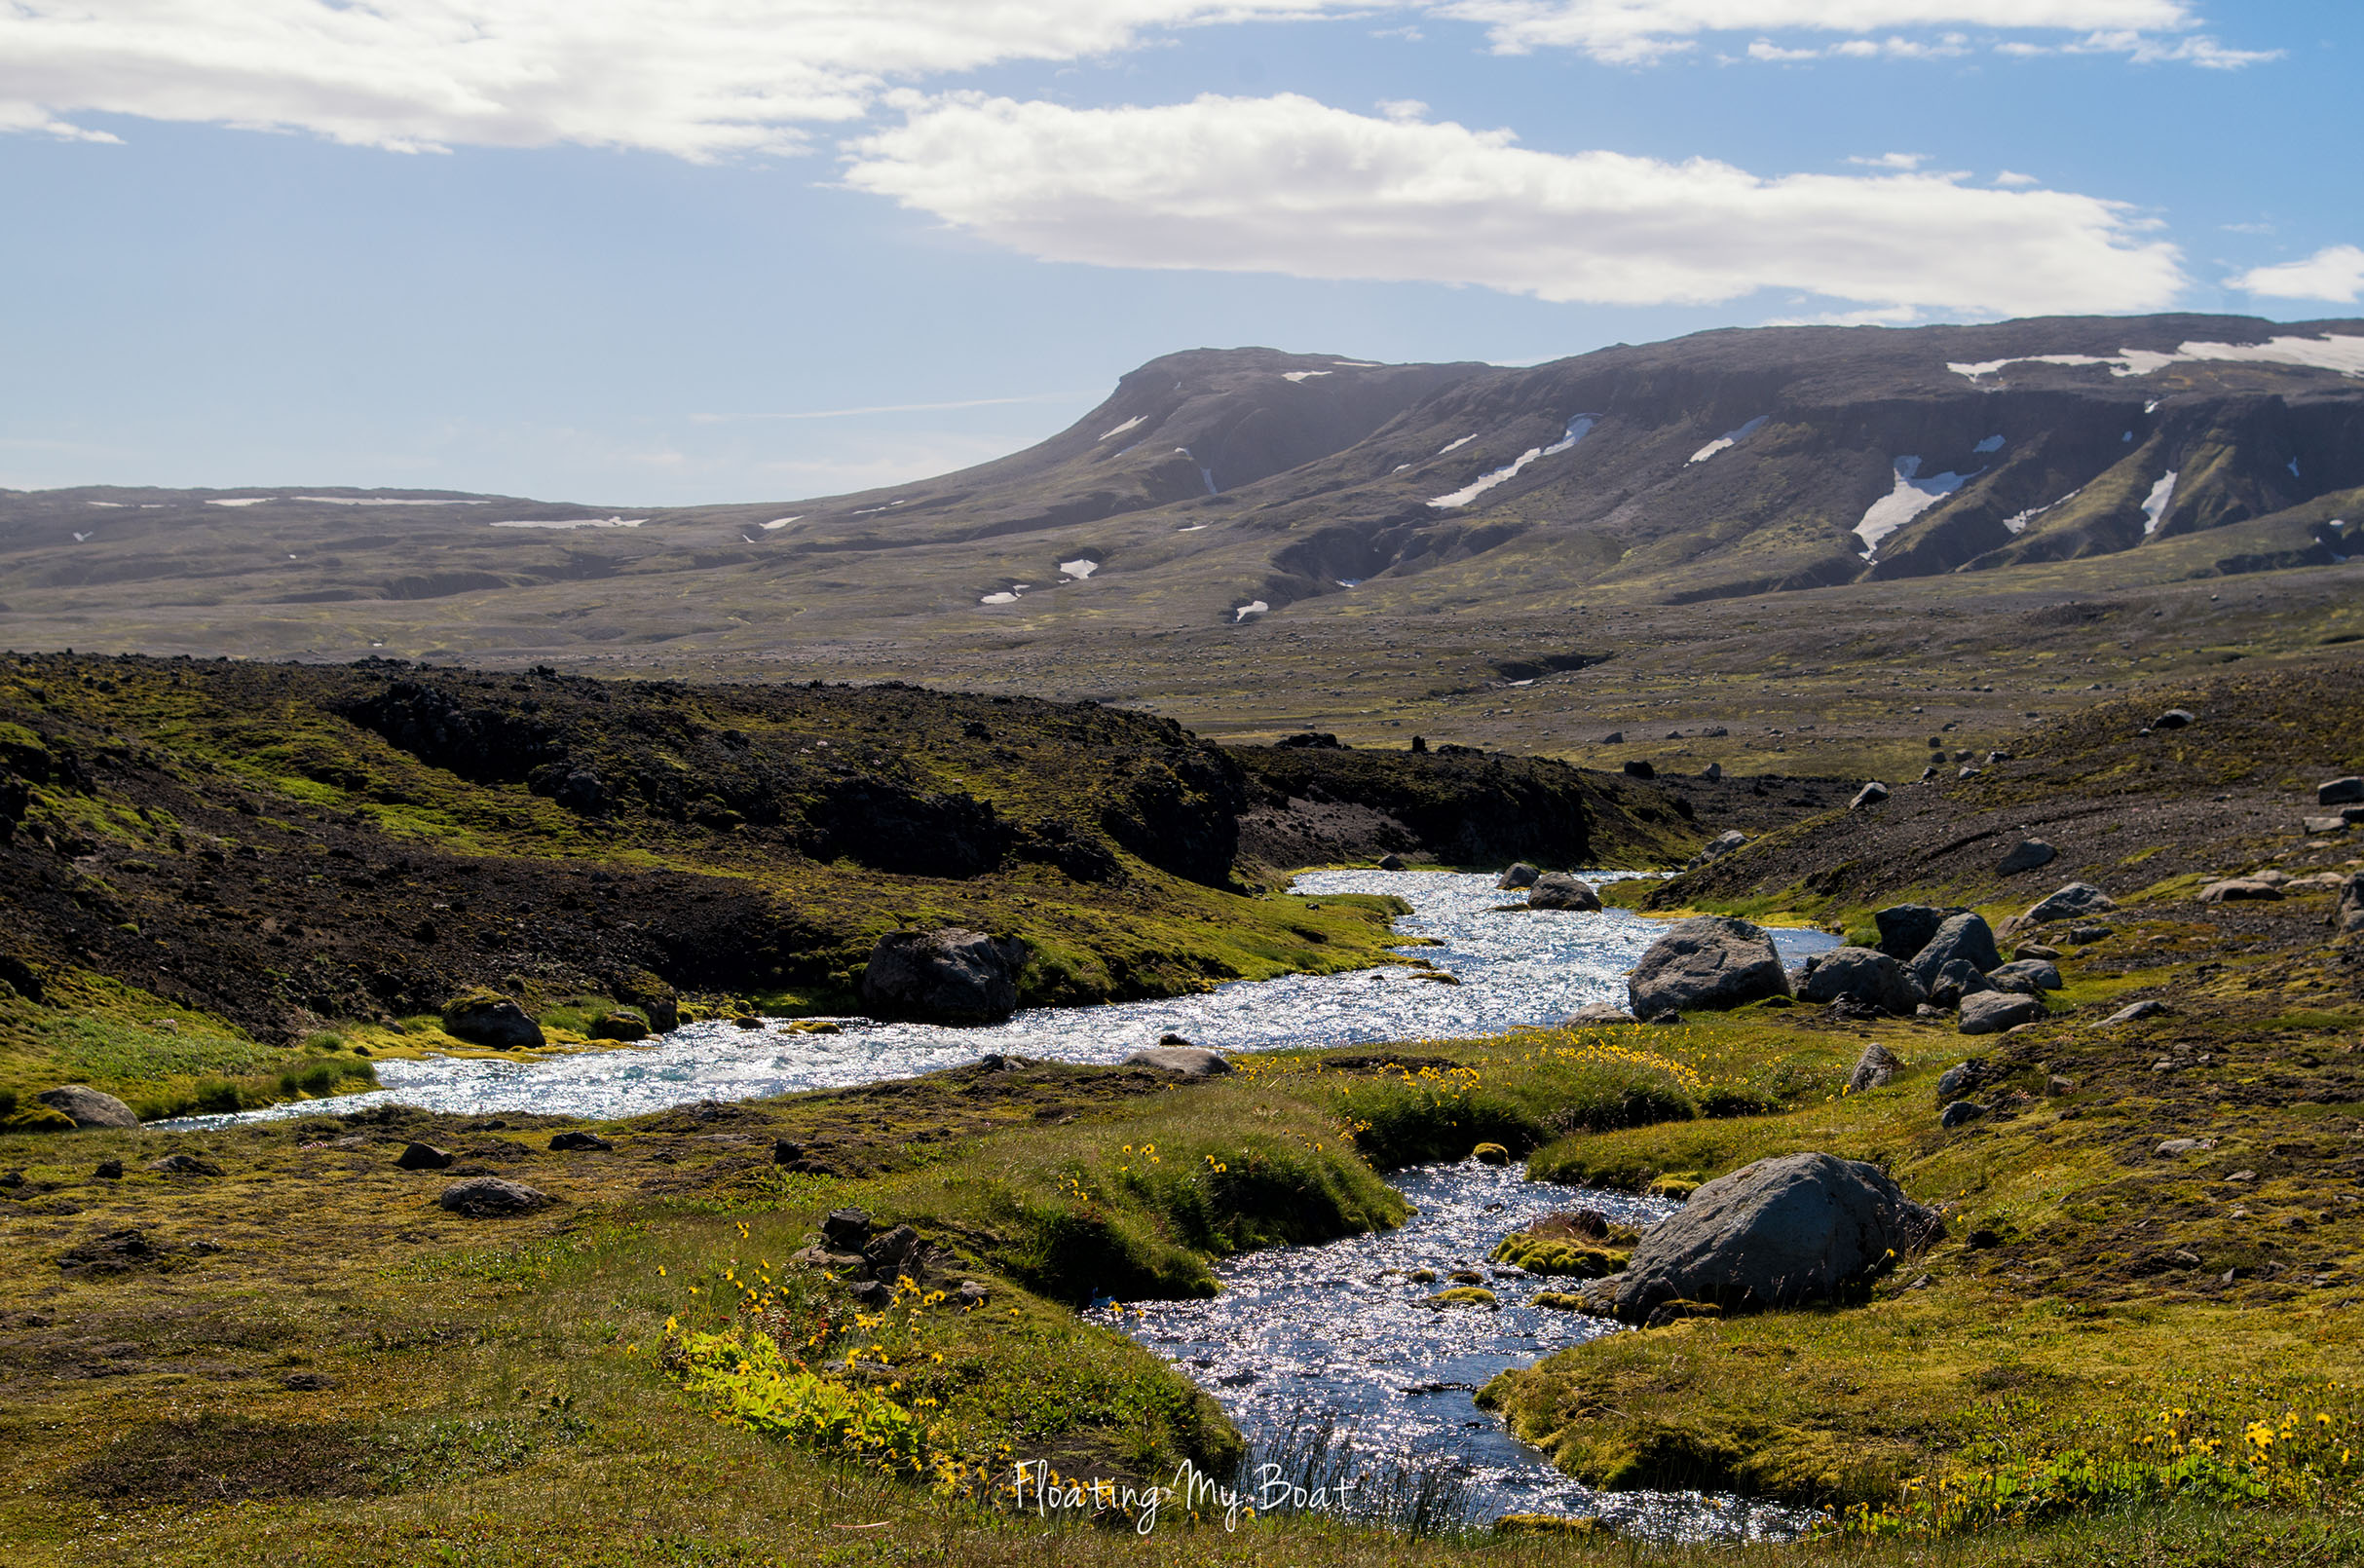 trekking-iceland-vatnajokull-national-park-46